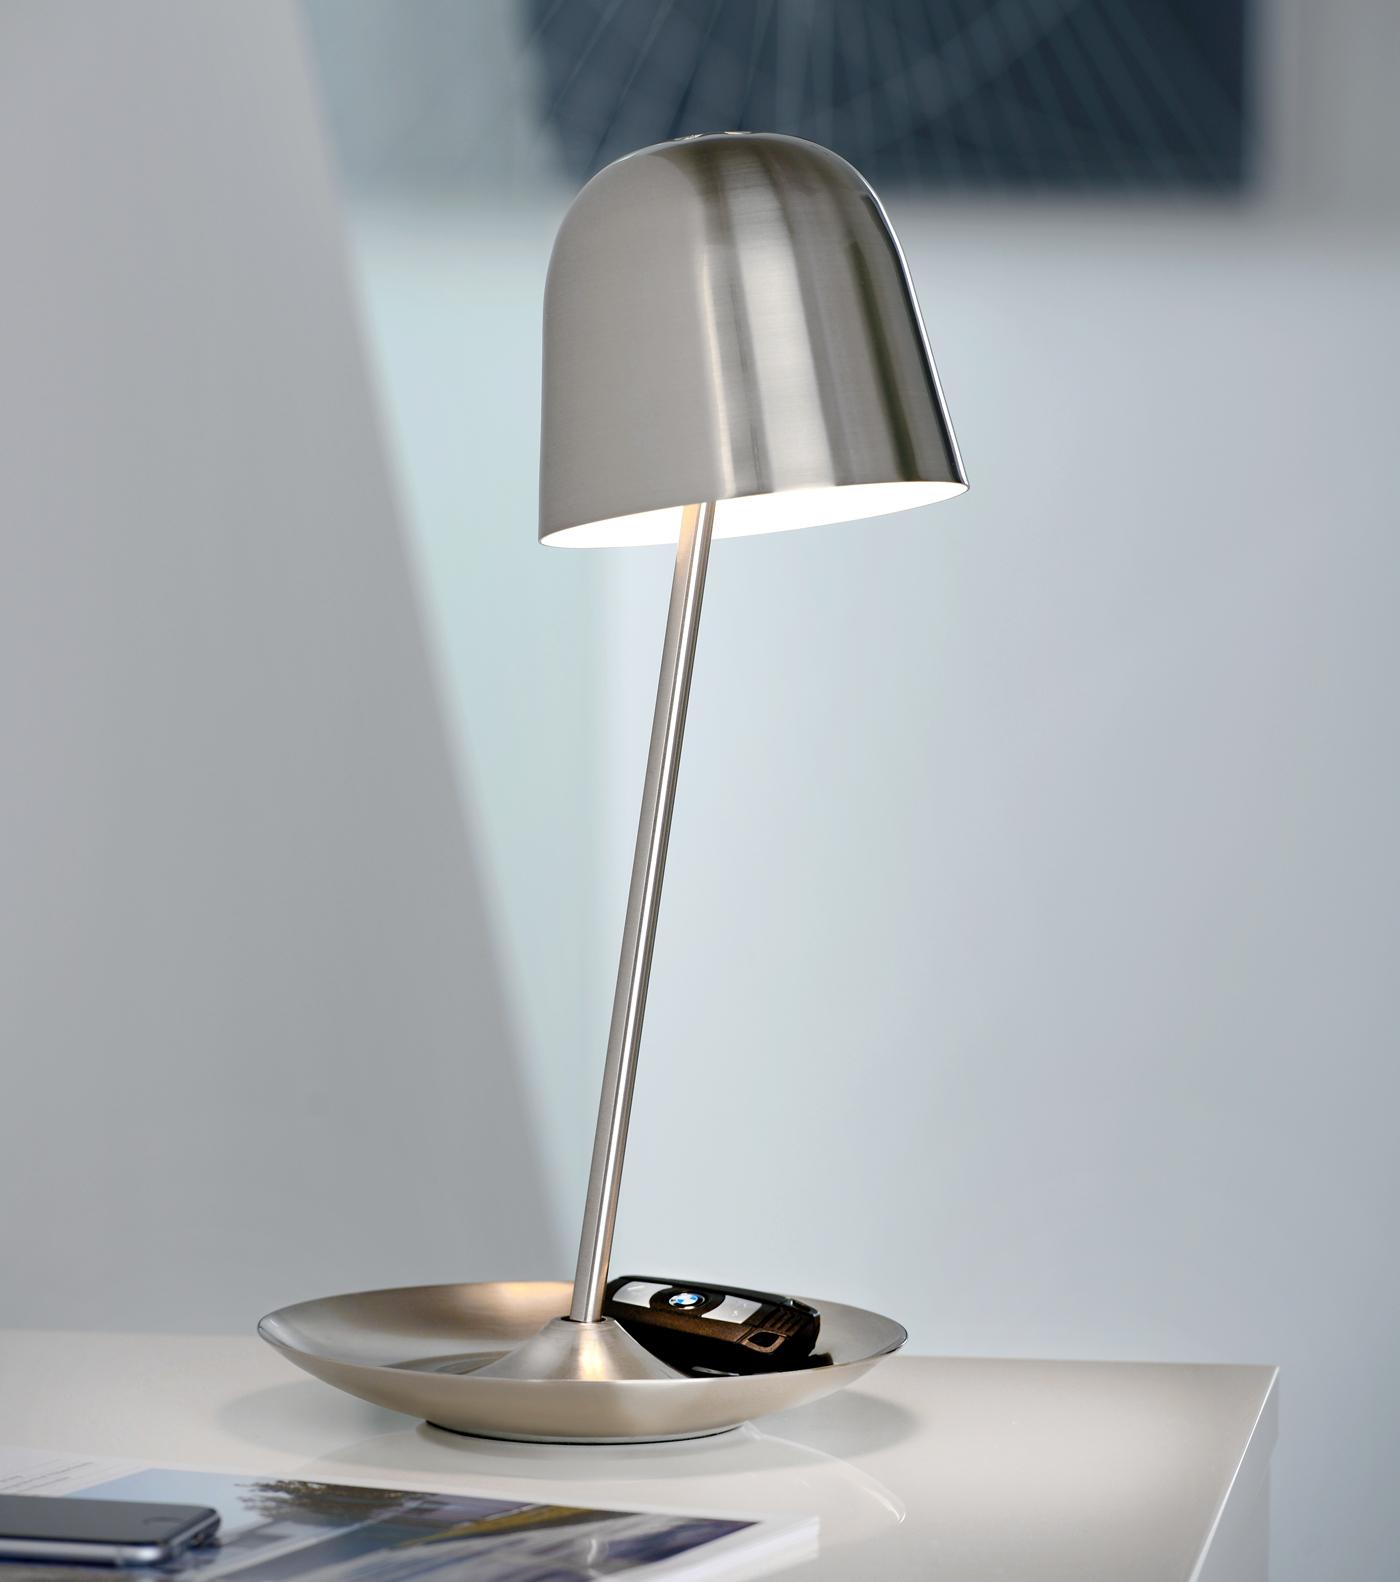 Strange Eduard Euwens Pirol Table Lamp Sompex 2013 2014 Home Interior And Landscaping Mentranervesignezvosmurscom